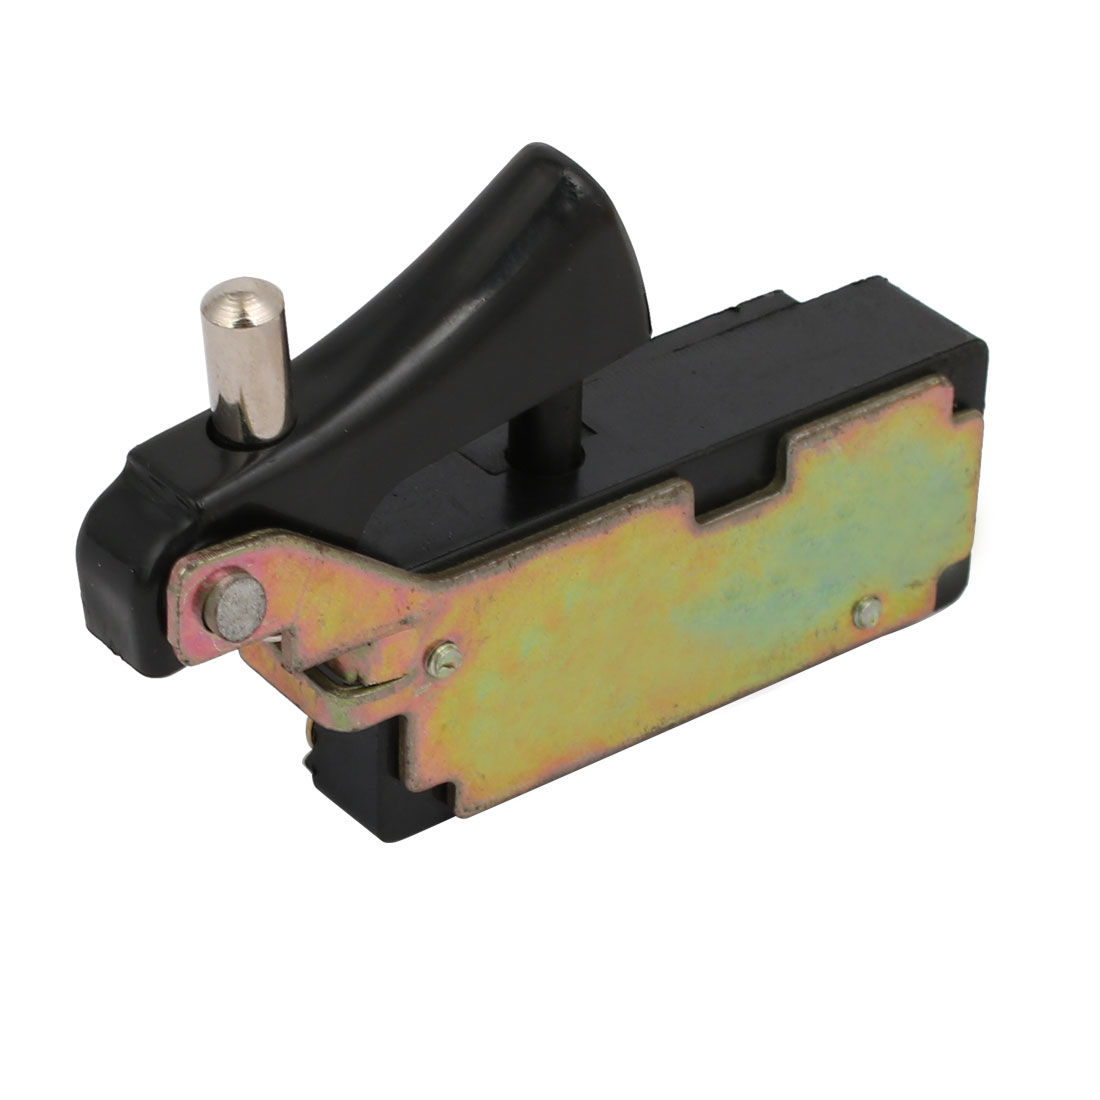 FB7-10/2W1 AC250V Plastic SPST Power Tool Trigger Button Switch for Hitachi